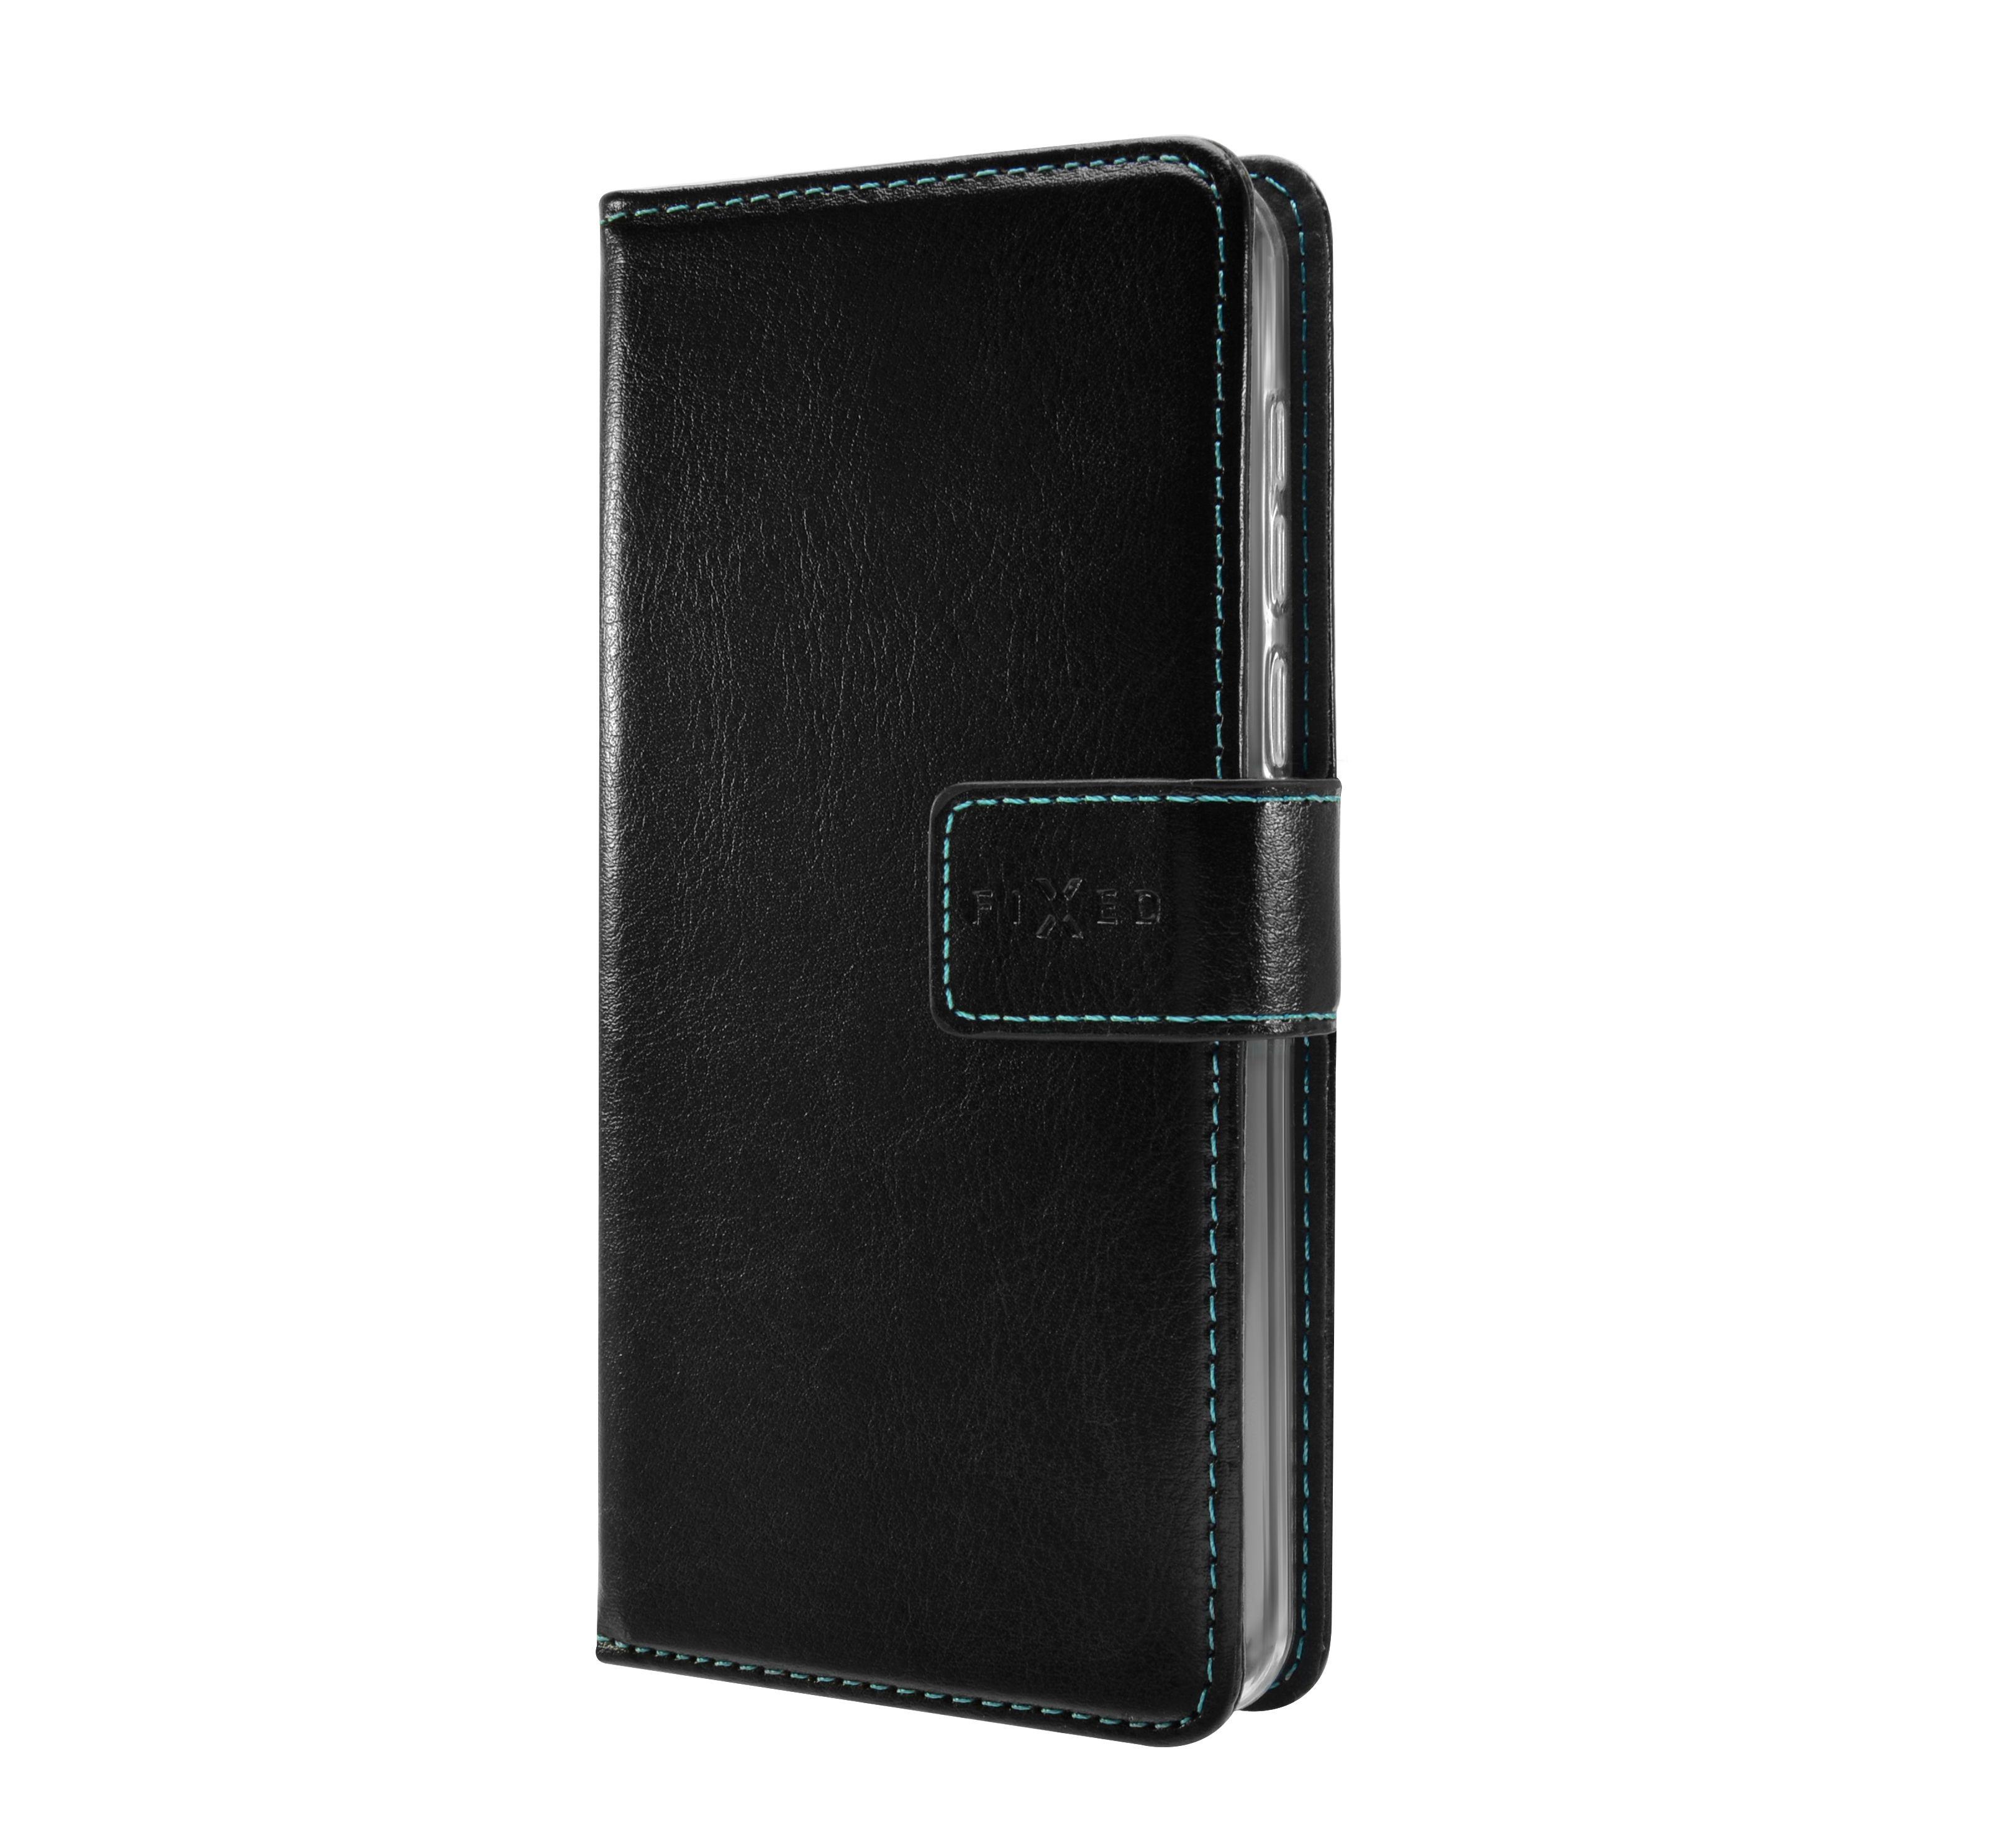 Pouzdro typu kniha FIXED Opus pro Xiaomi Redmi Note 7/7 Pro, černé